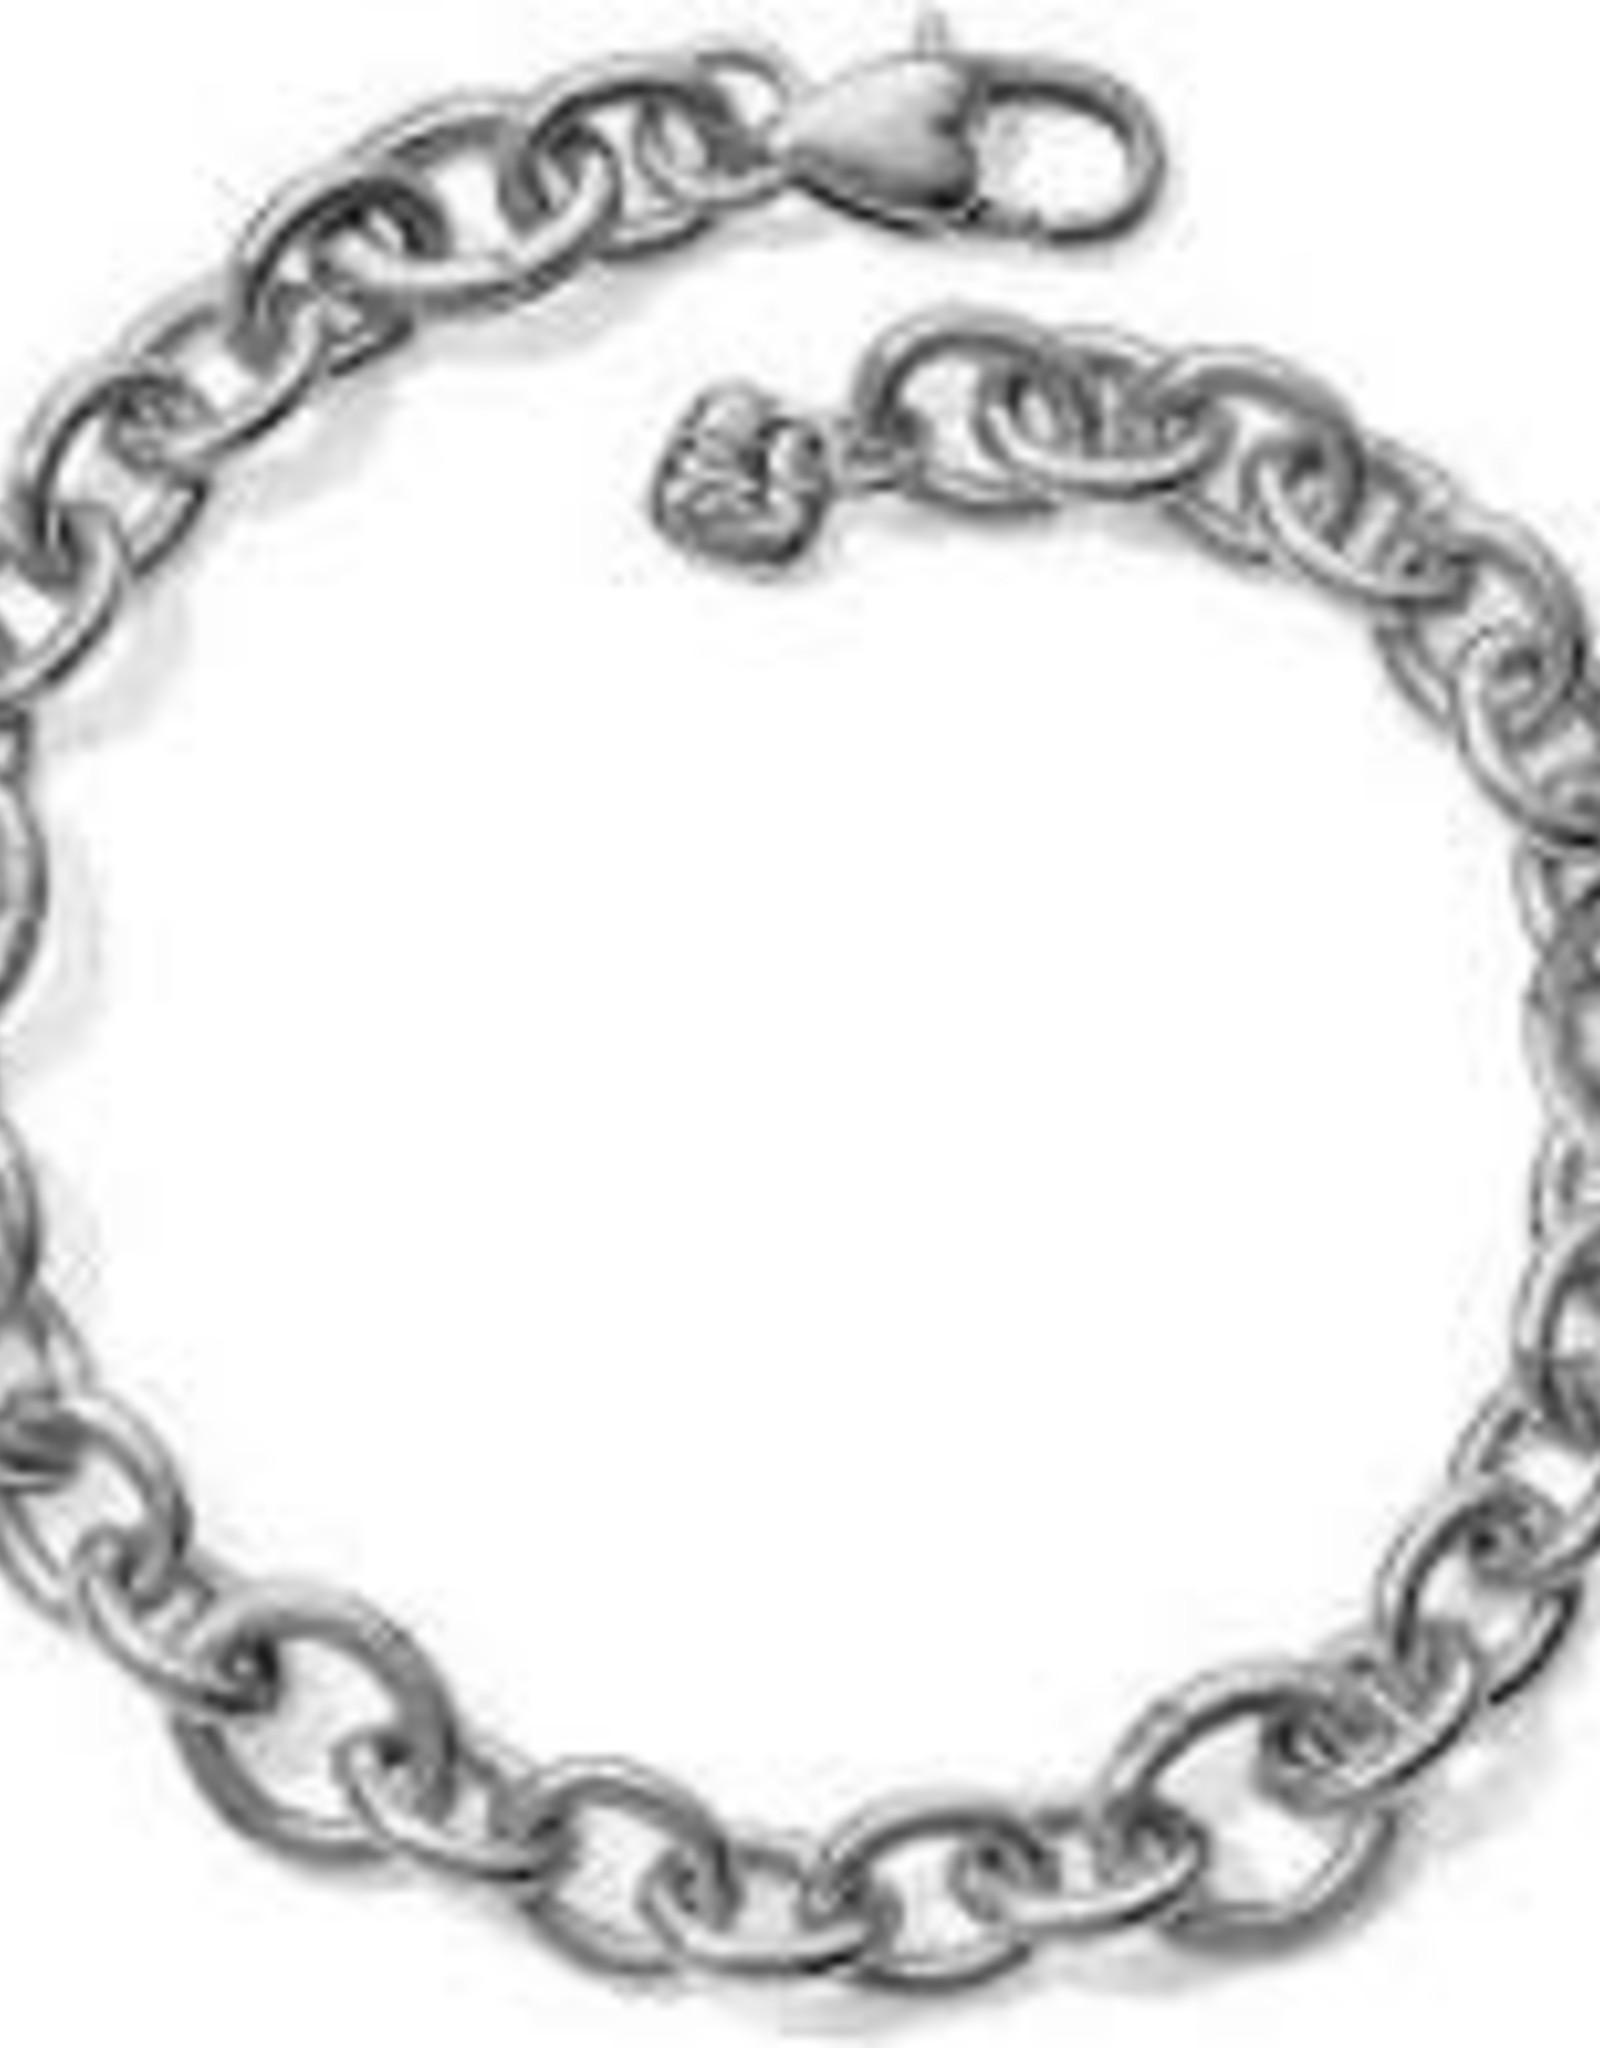 Brighton Brighton Charm Bracelet- Amulet- Luxe Link